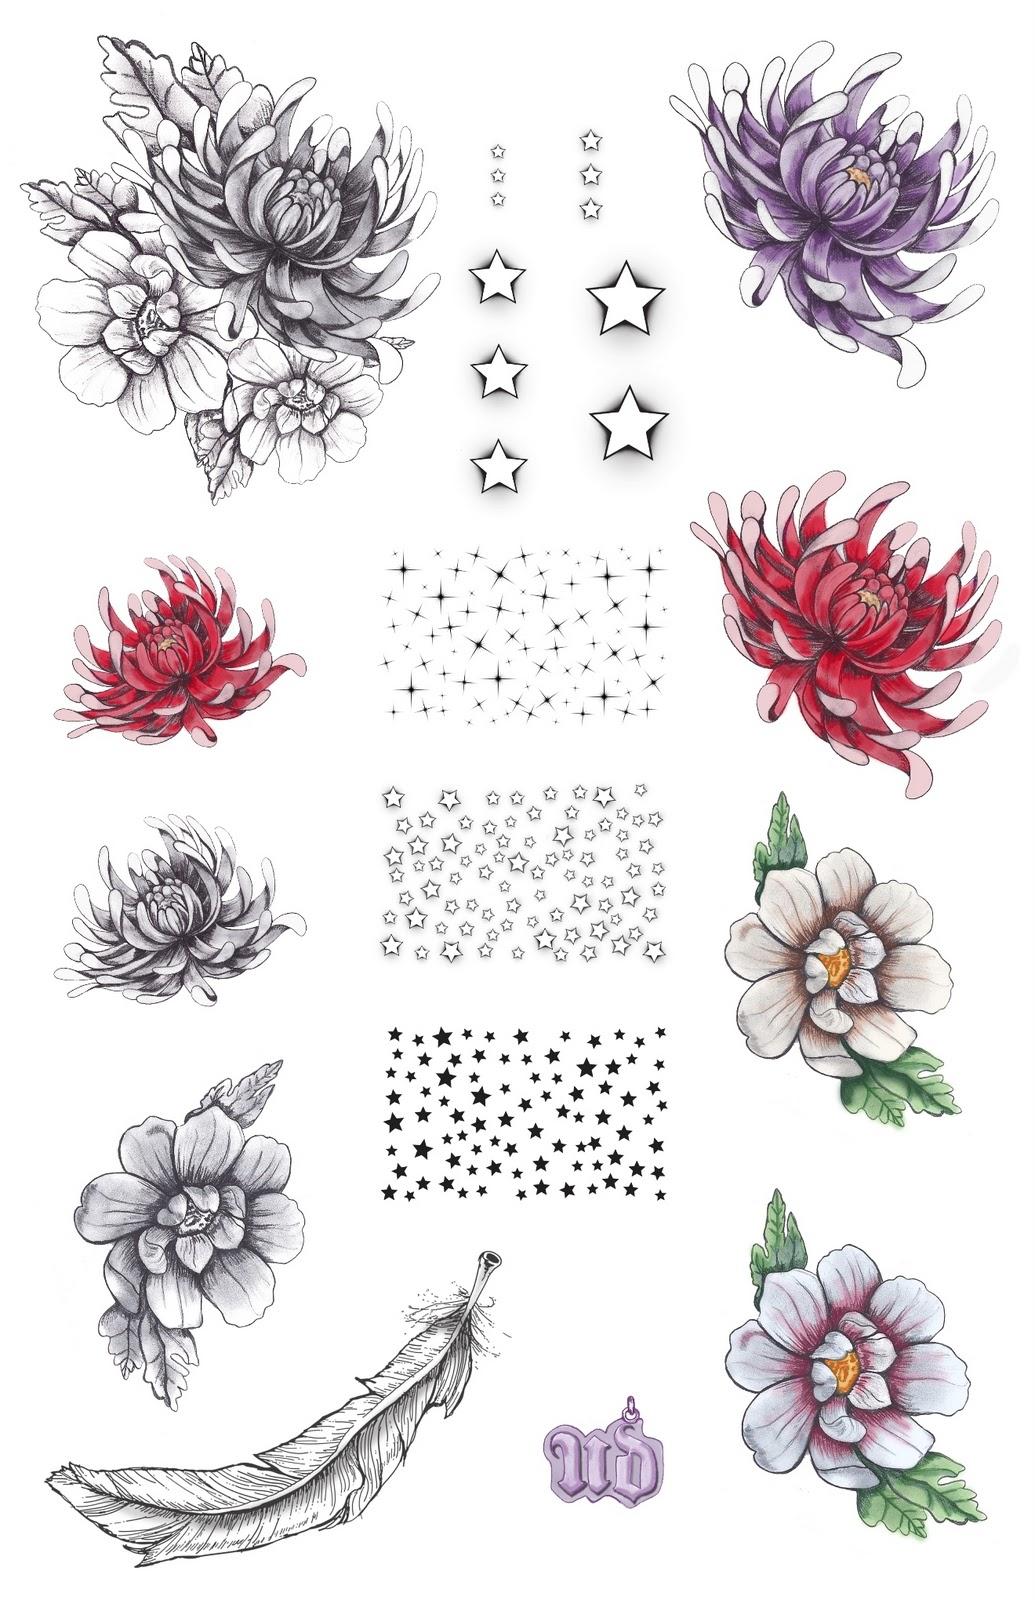 http://3.bp.blogspot.com/_doMzGF0zZBw/TLQ640so6uI/AAAAAAAAEJs/ZbN4vSe2S2M/s1600/Tattoos_FlowersStarsLOW.jpg